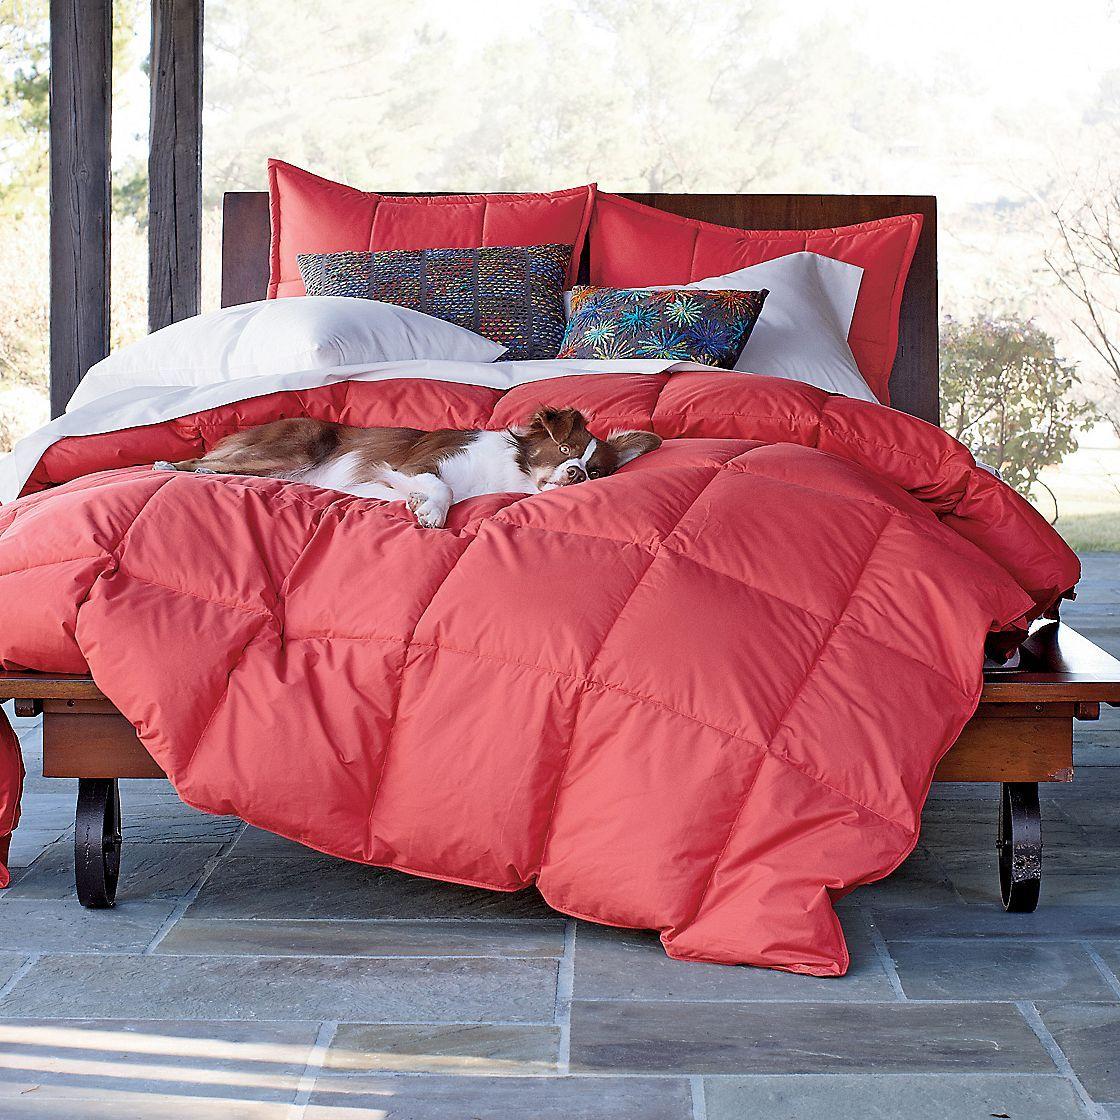 manor coral home avondale dp comforter kitchen cherie piece queen com amazon set